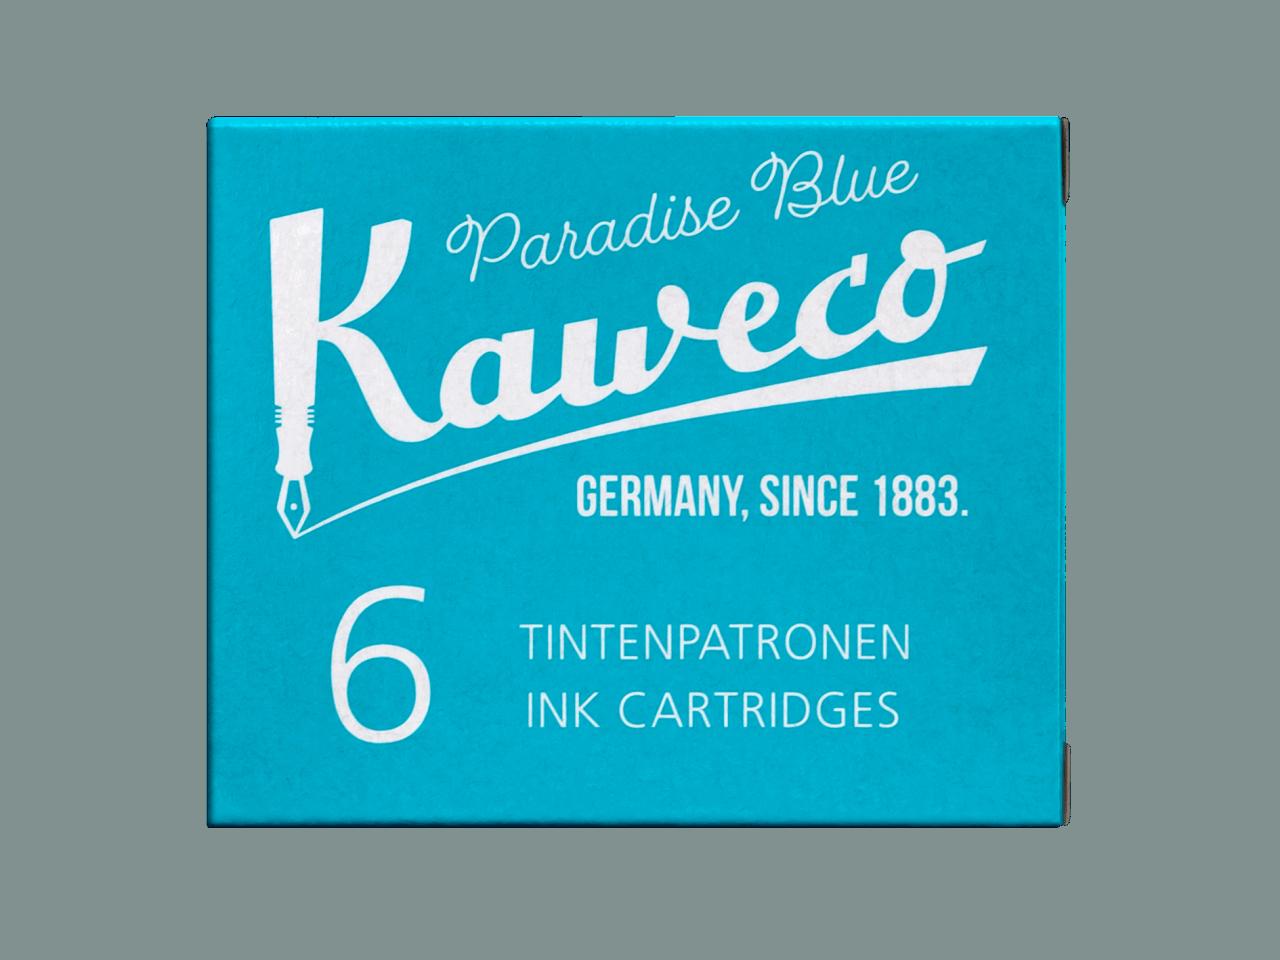 Kaweco Tintenpatronen 6 Stück - Paradies Blau